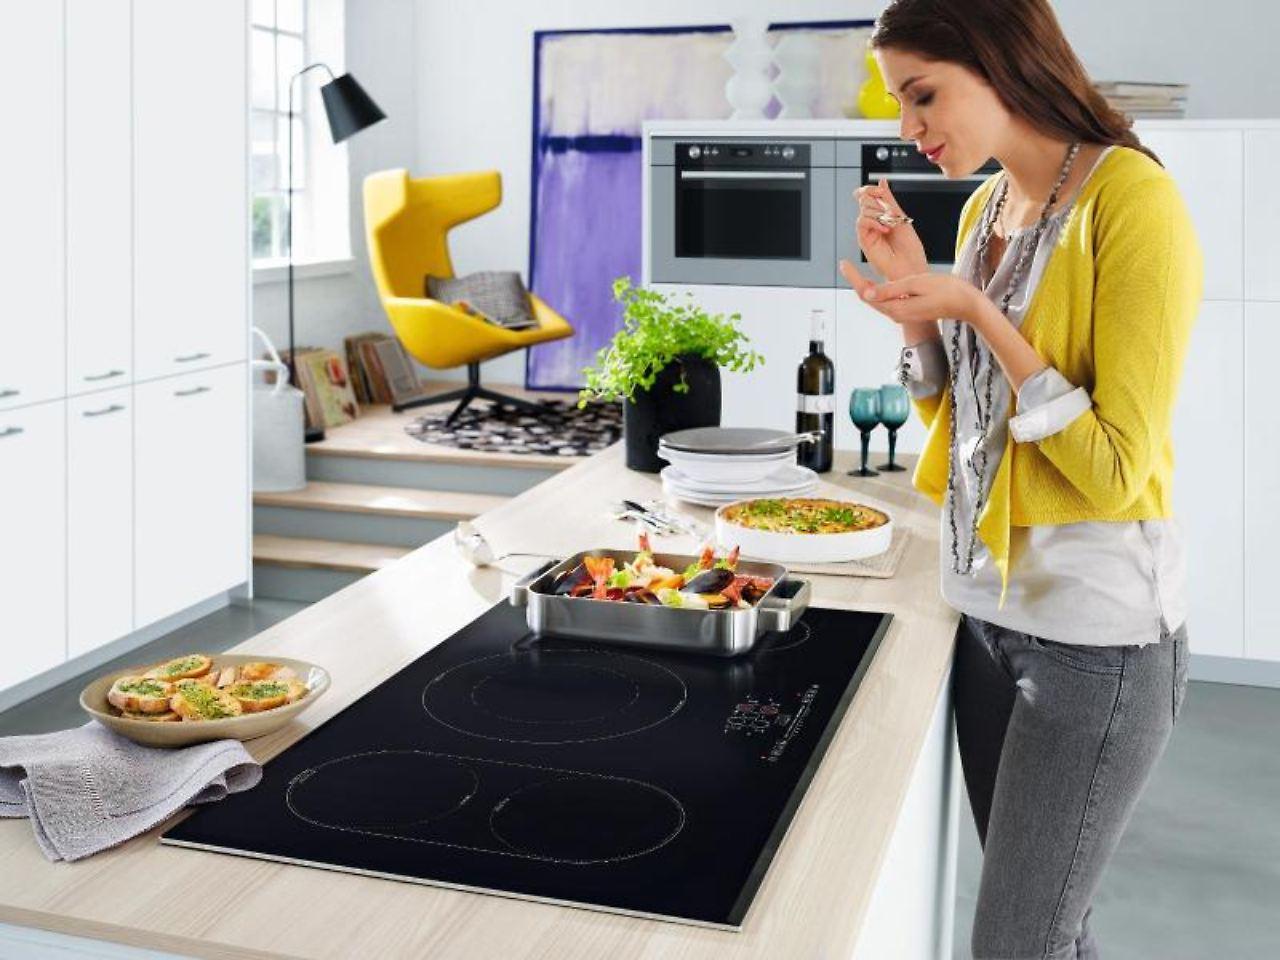 induktion gas oder elektro das richtige kochfeld n. Black Bedroom Furniture Sets. Home Design Ideas